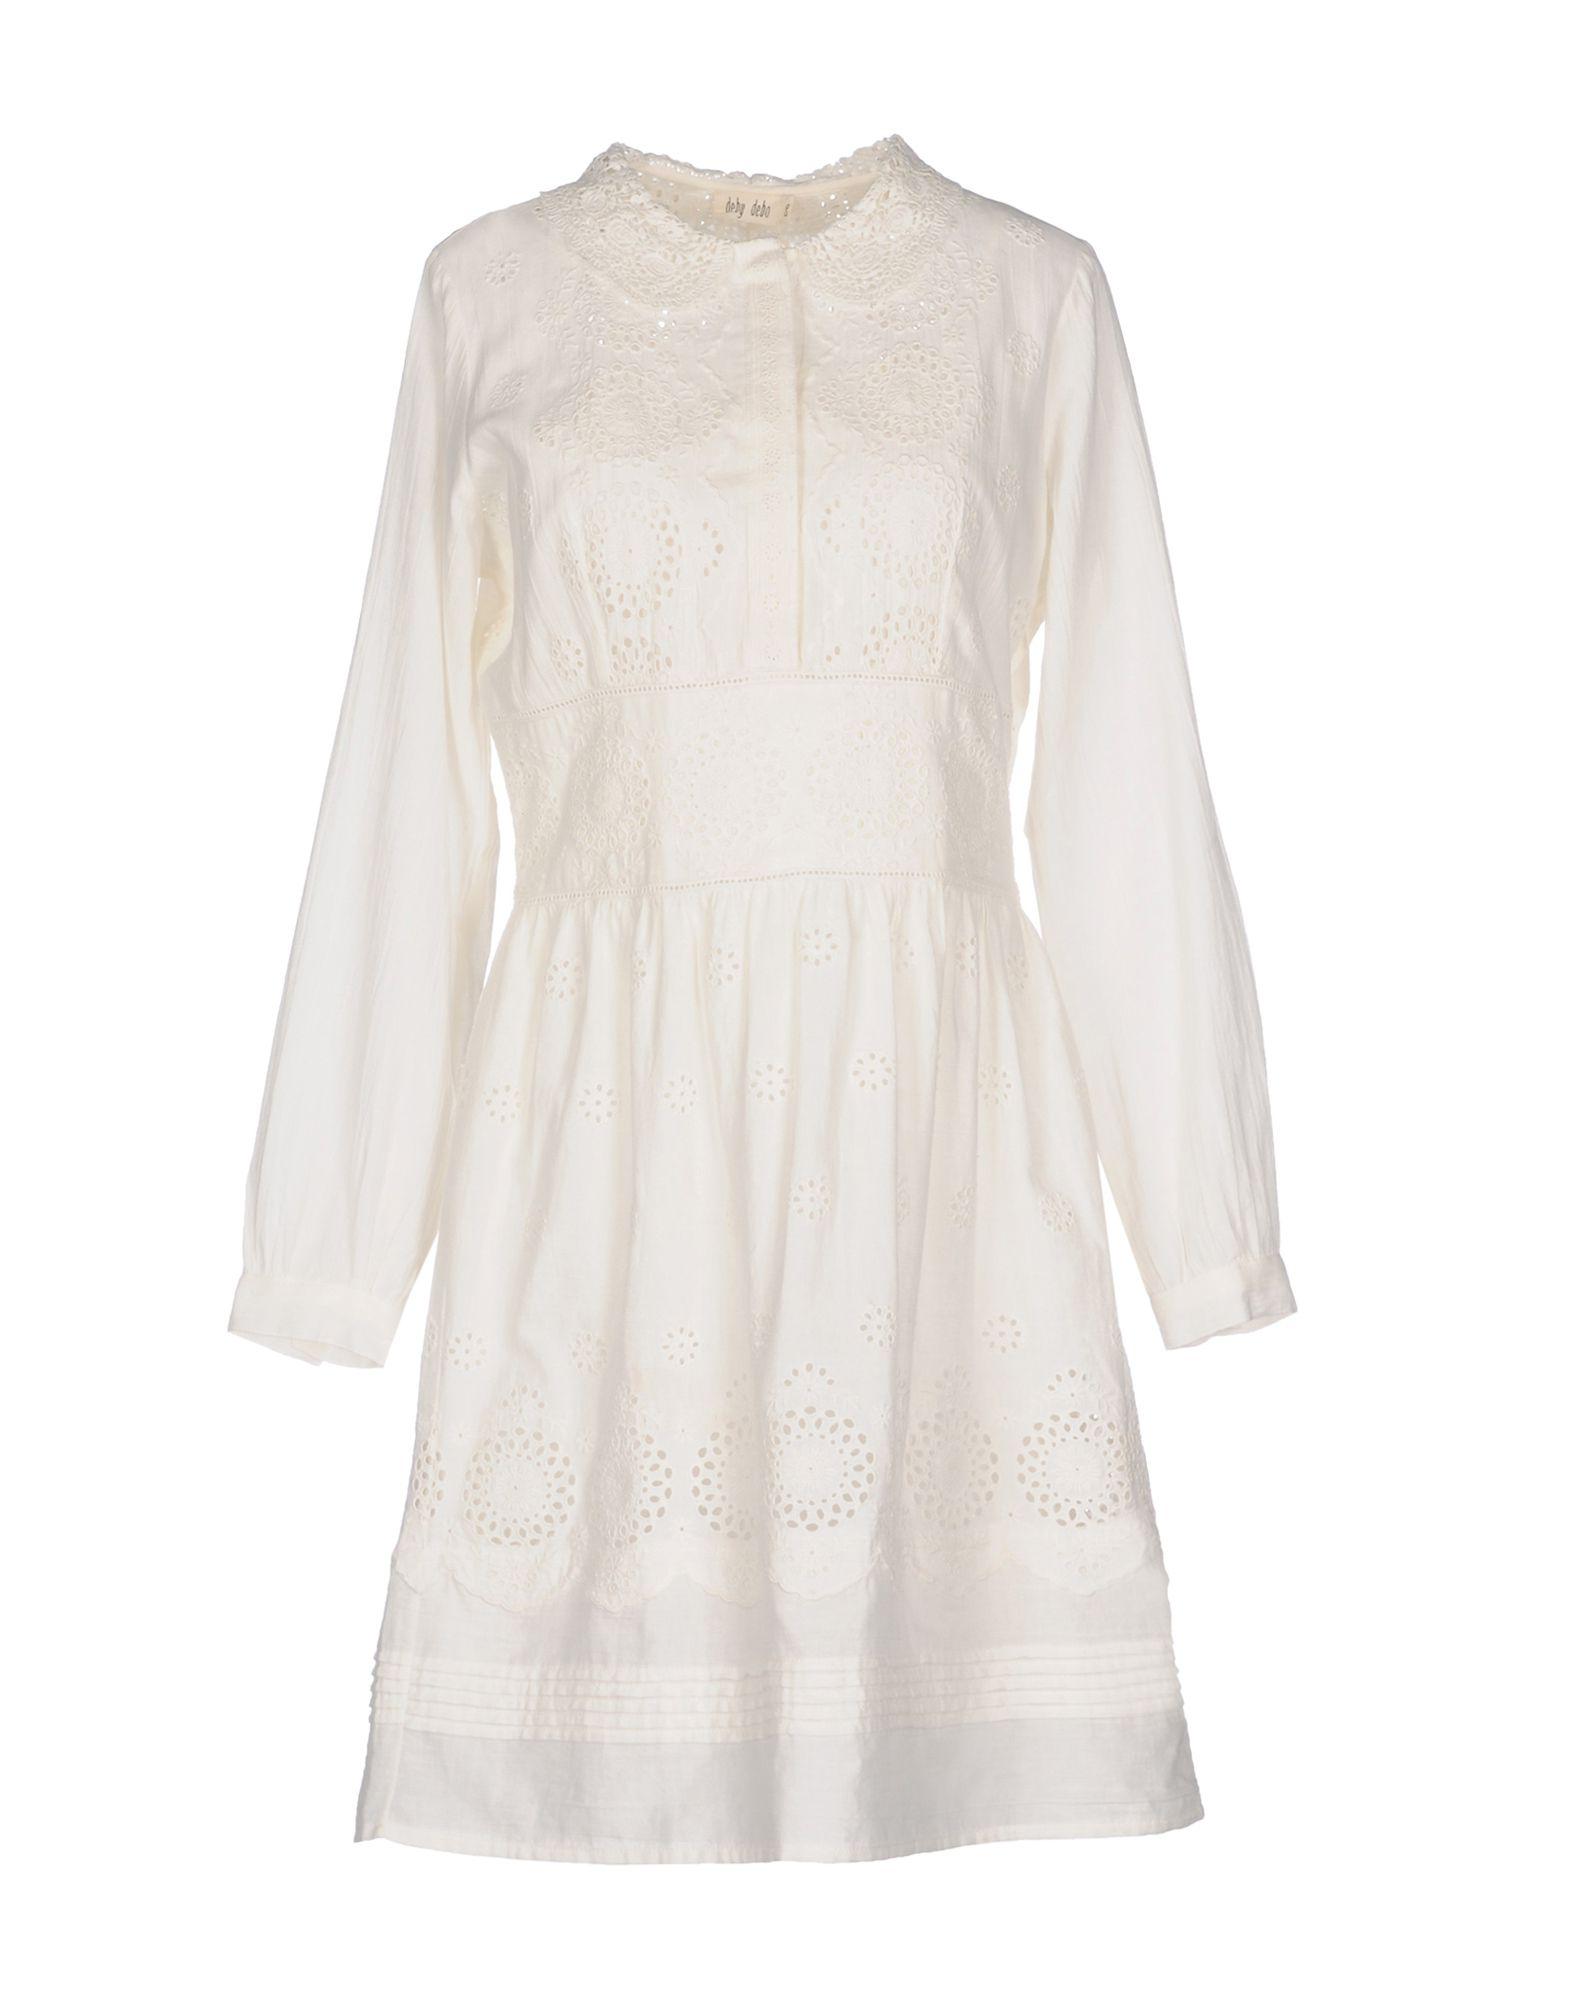 DEBY DEBO Short Dresses in White